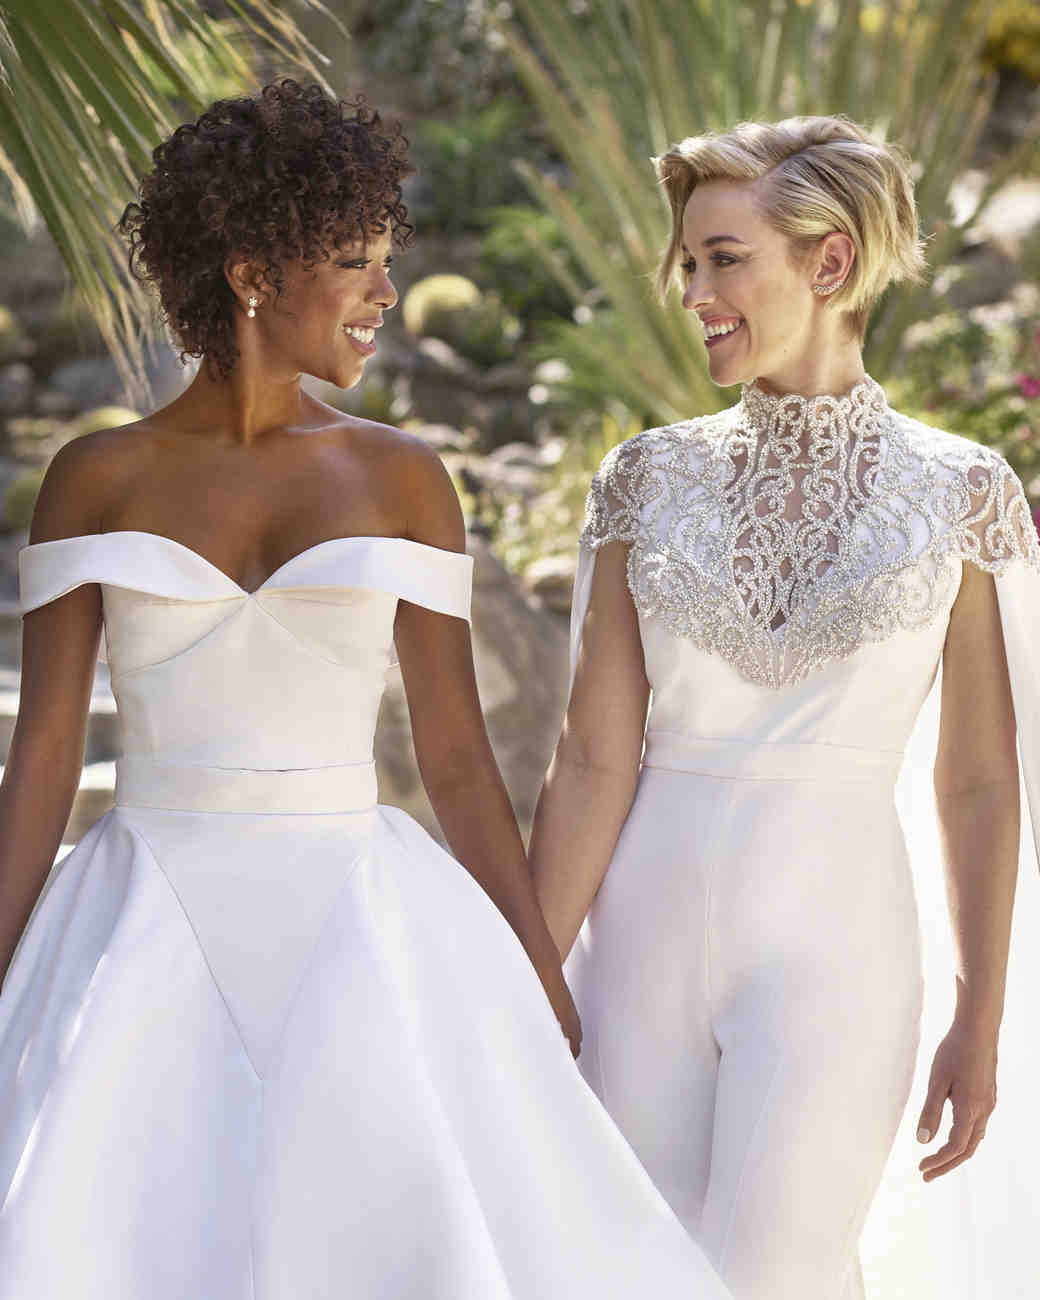 Samira Wiley and Lauren Morelli Married Palm Springs Wedding